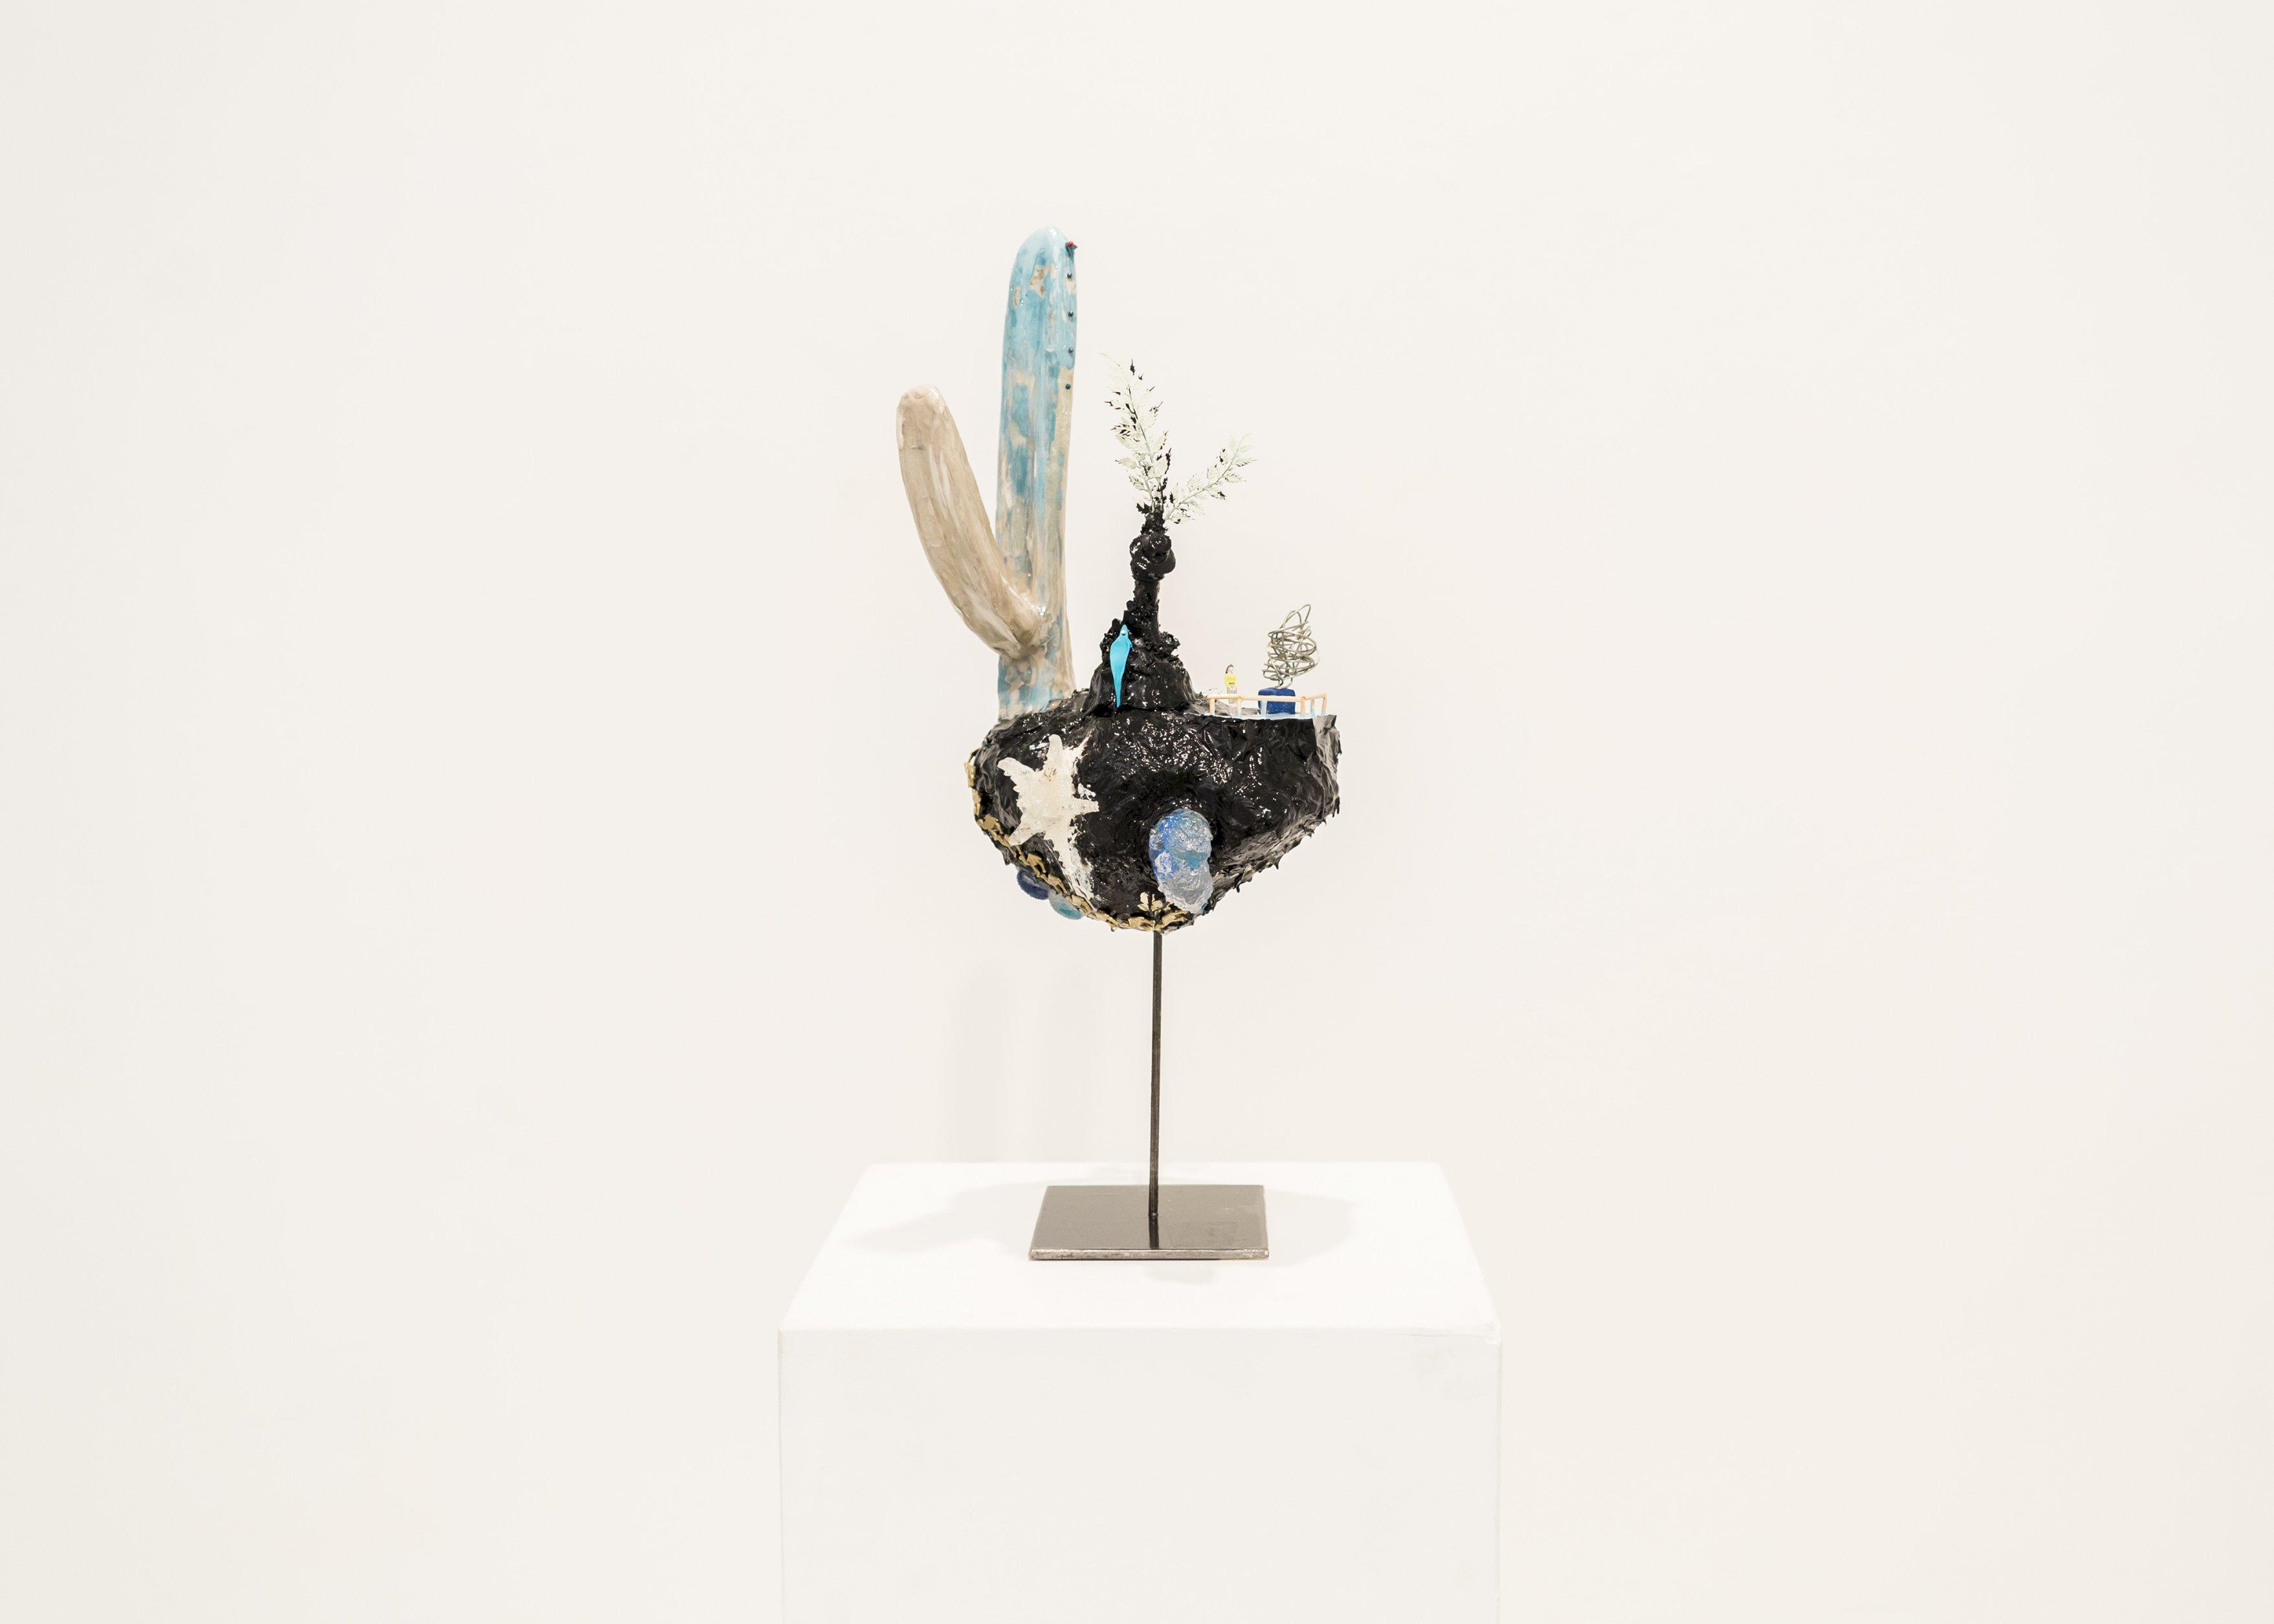 Micropaisaje III (2017) - Nicolás Laiz Placeres